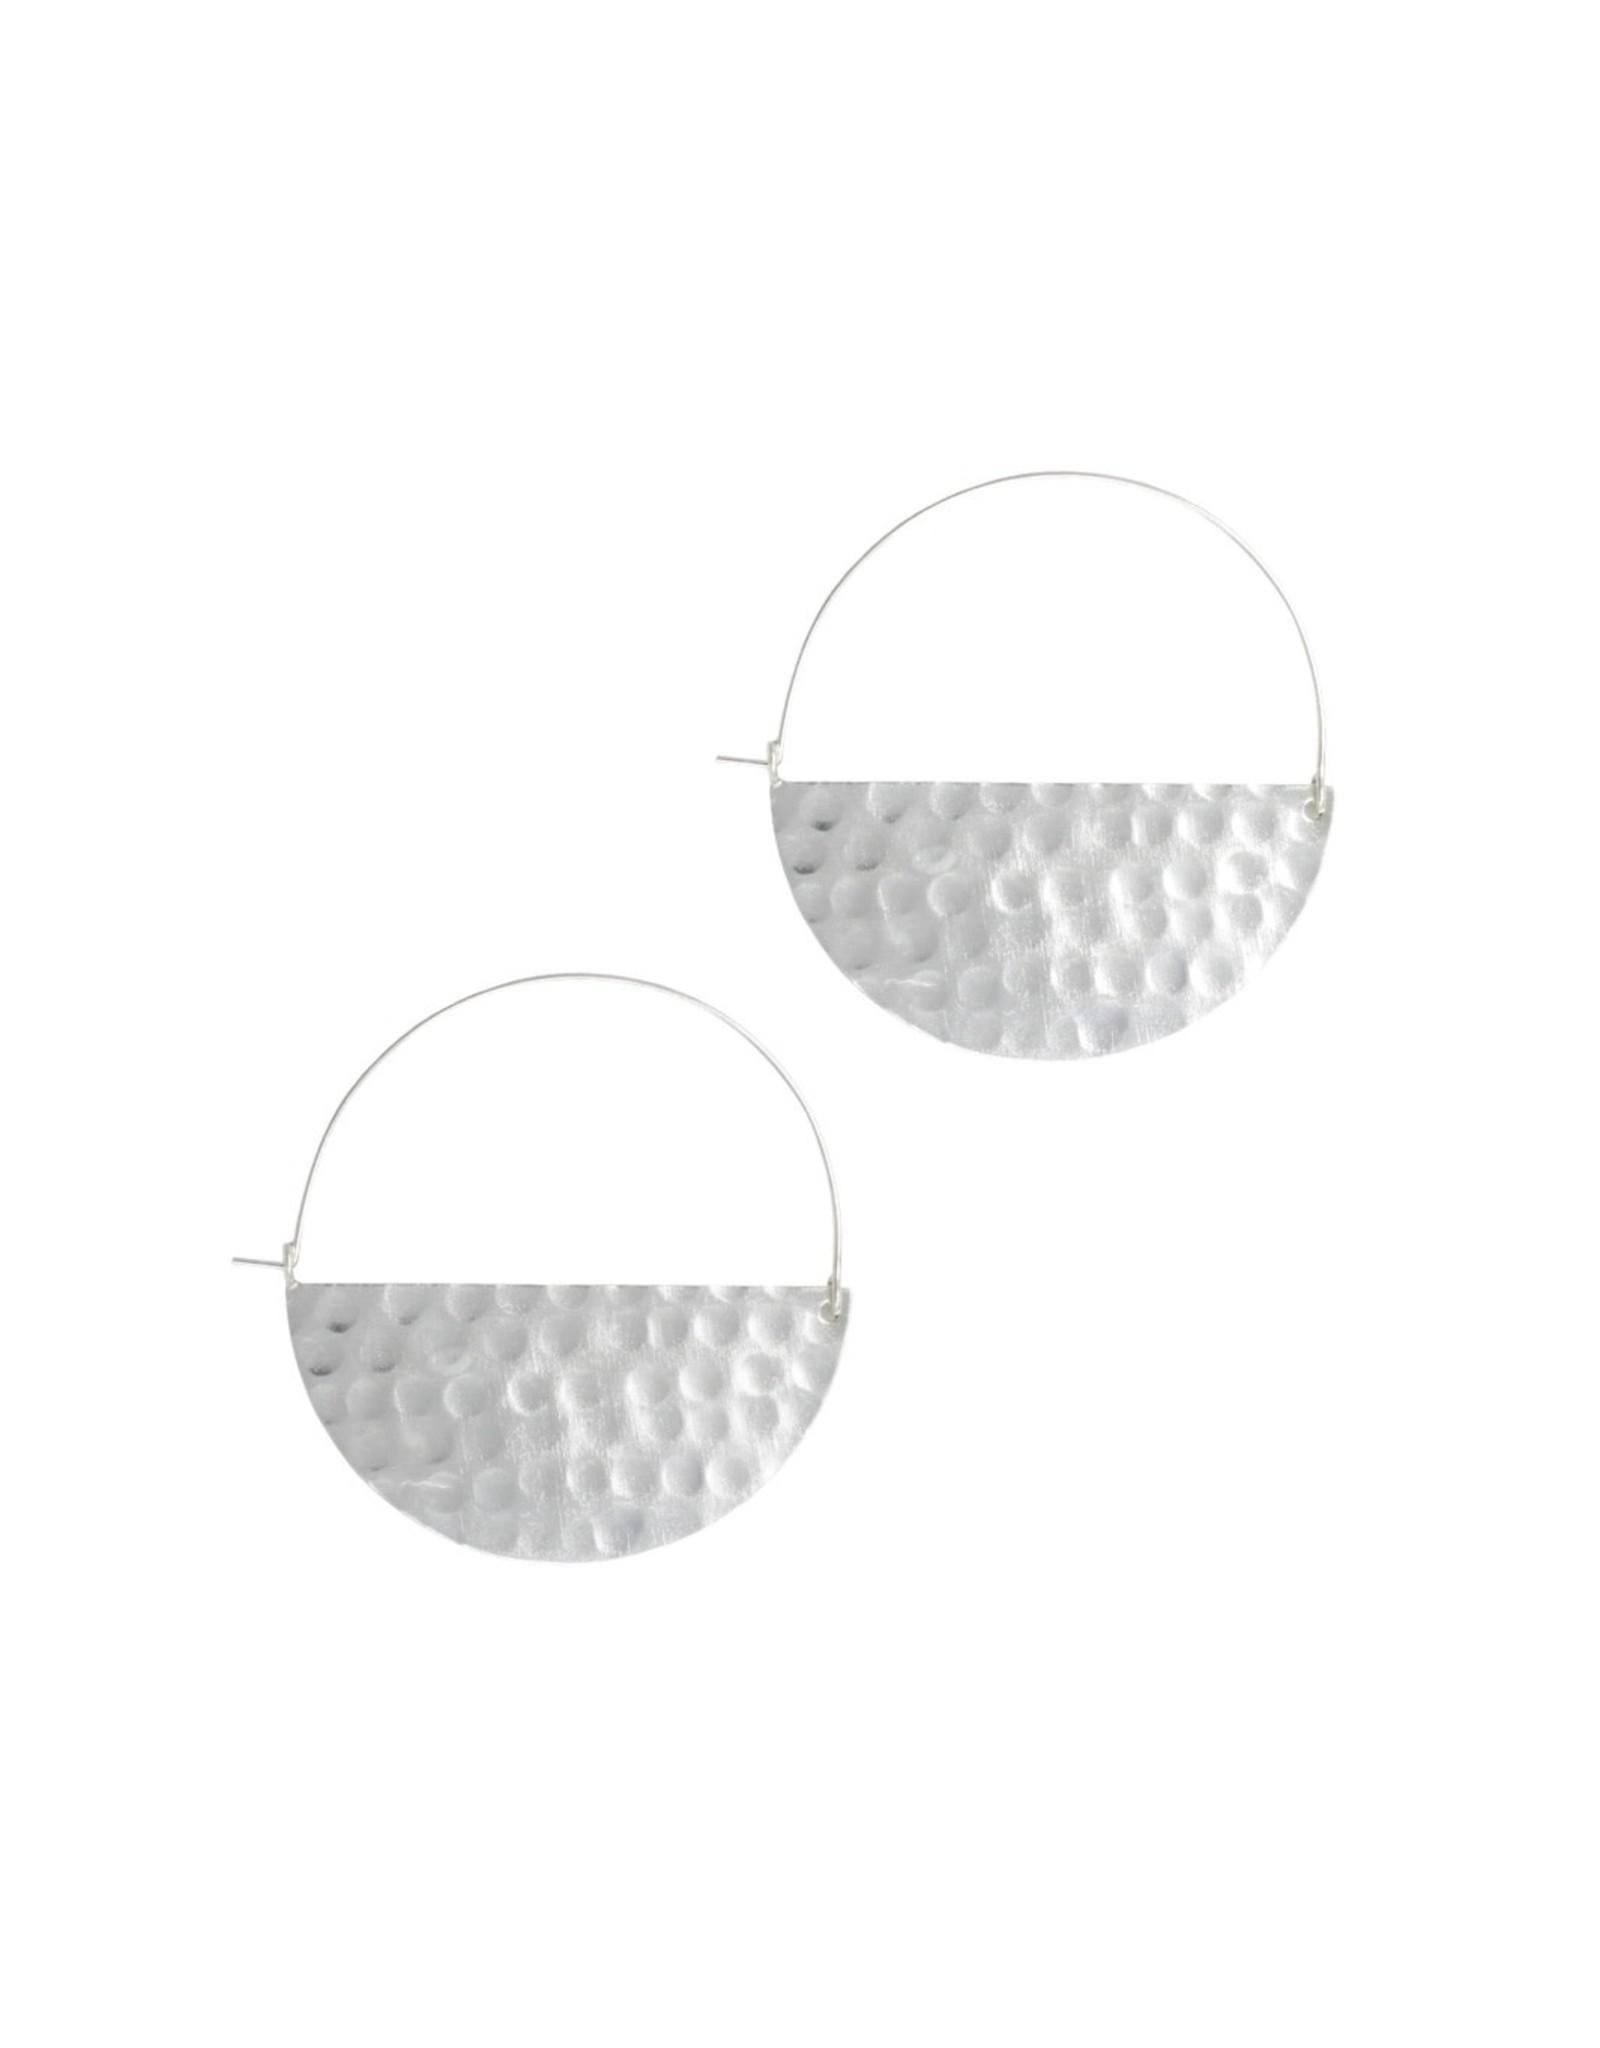 Rover & Kin Silver Large Half Moon Earrings